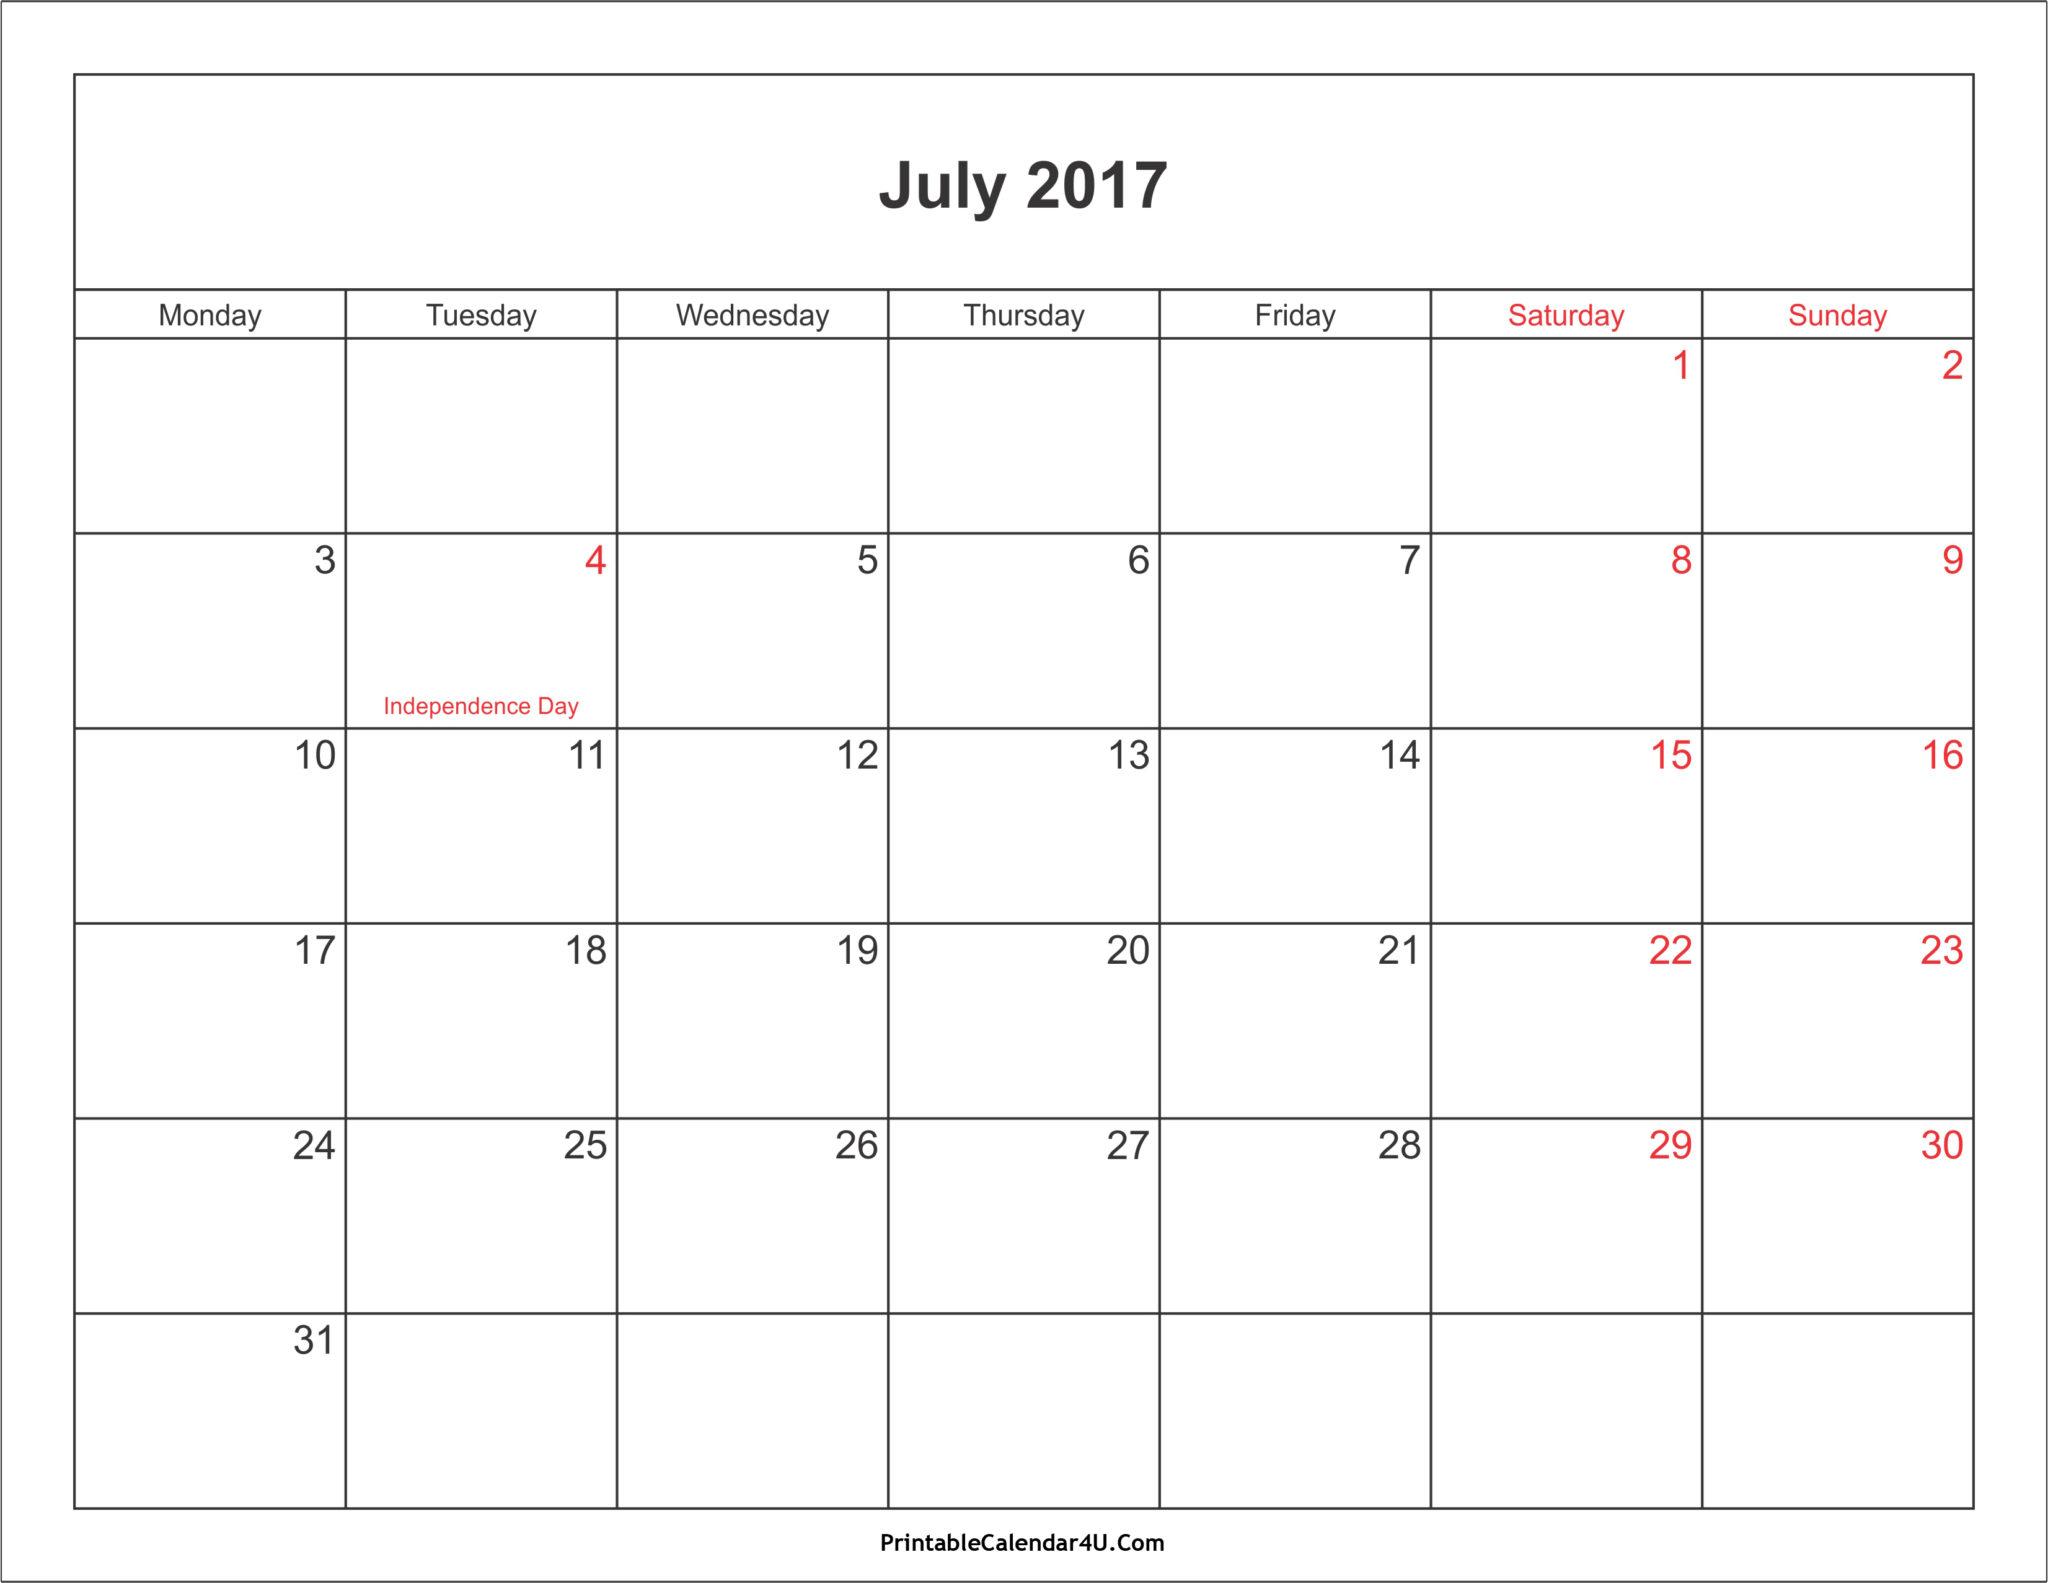 July 2017 Calendar printable with holidays